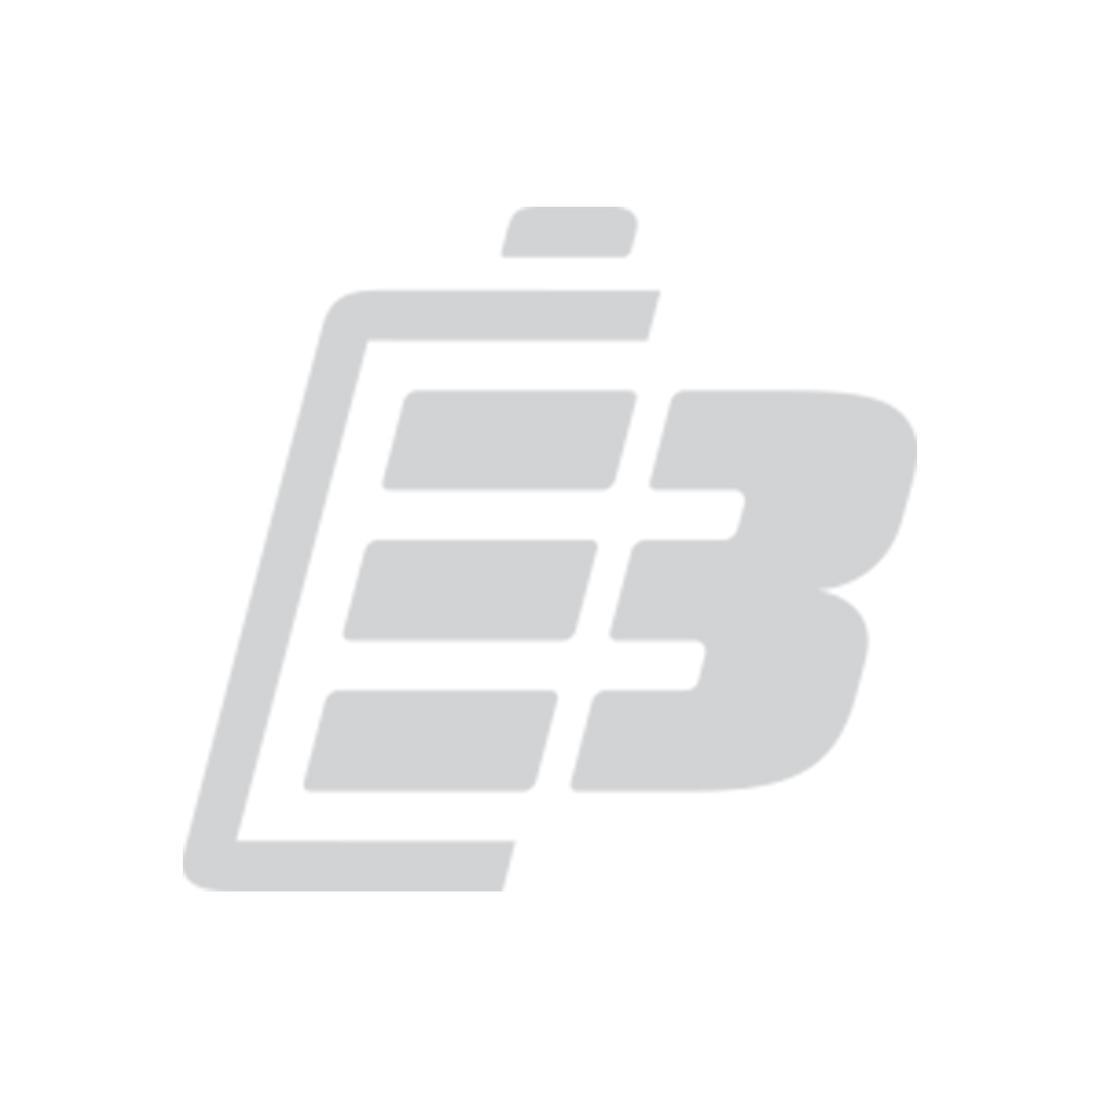 Cordless phone battery Ericsson DT230_1